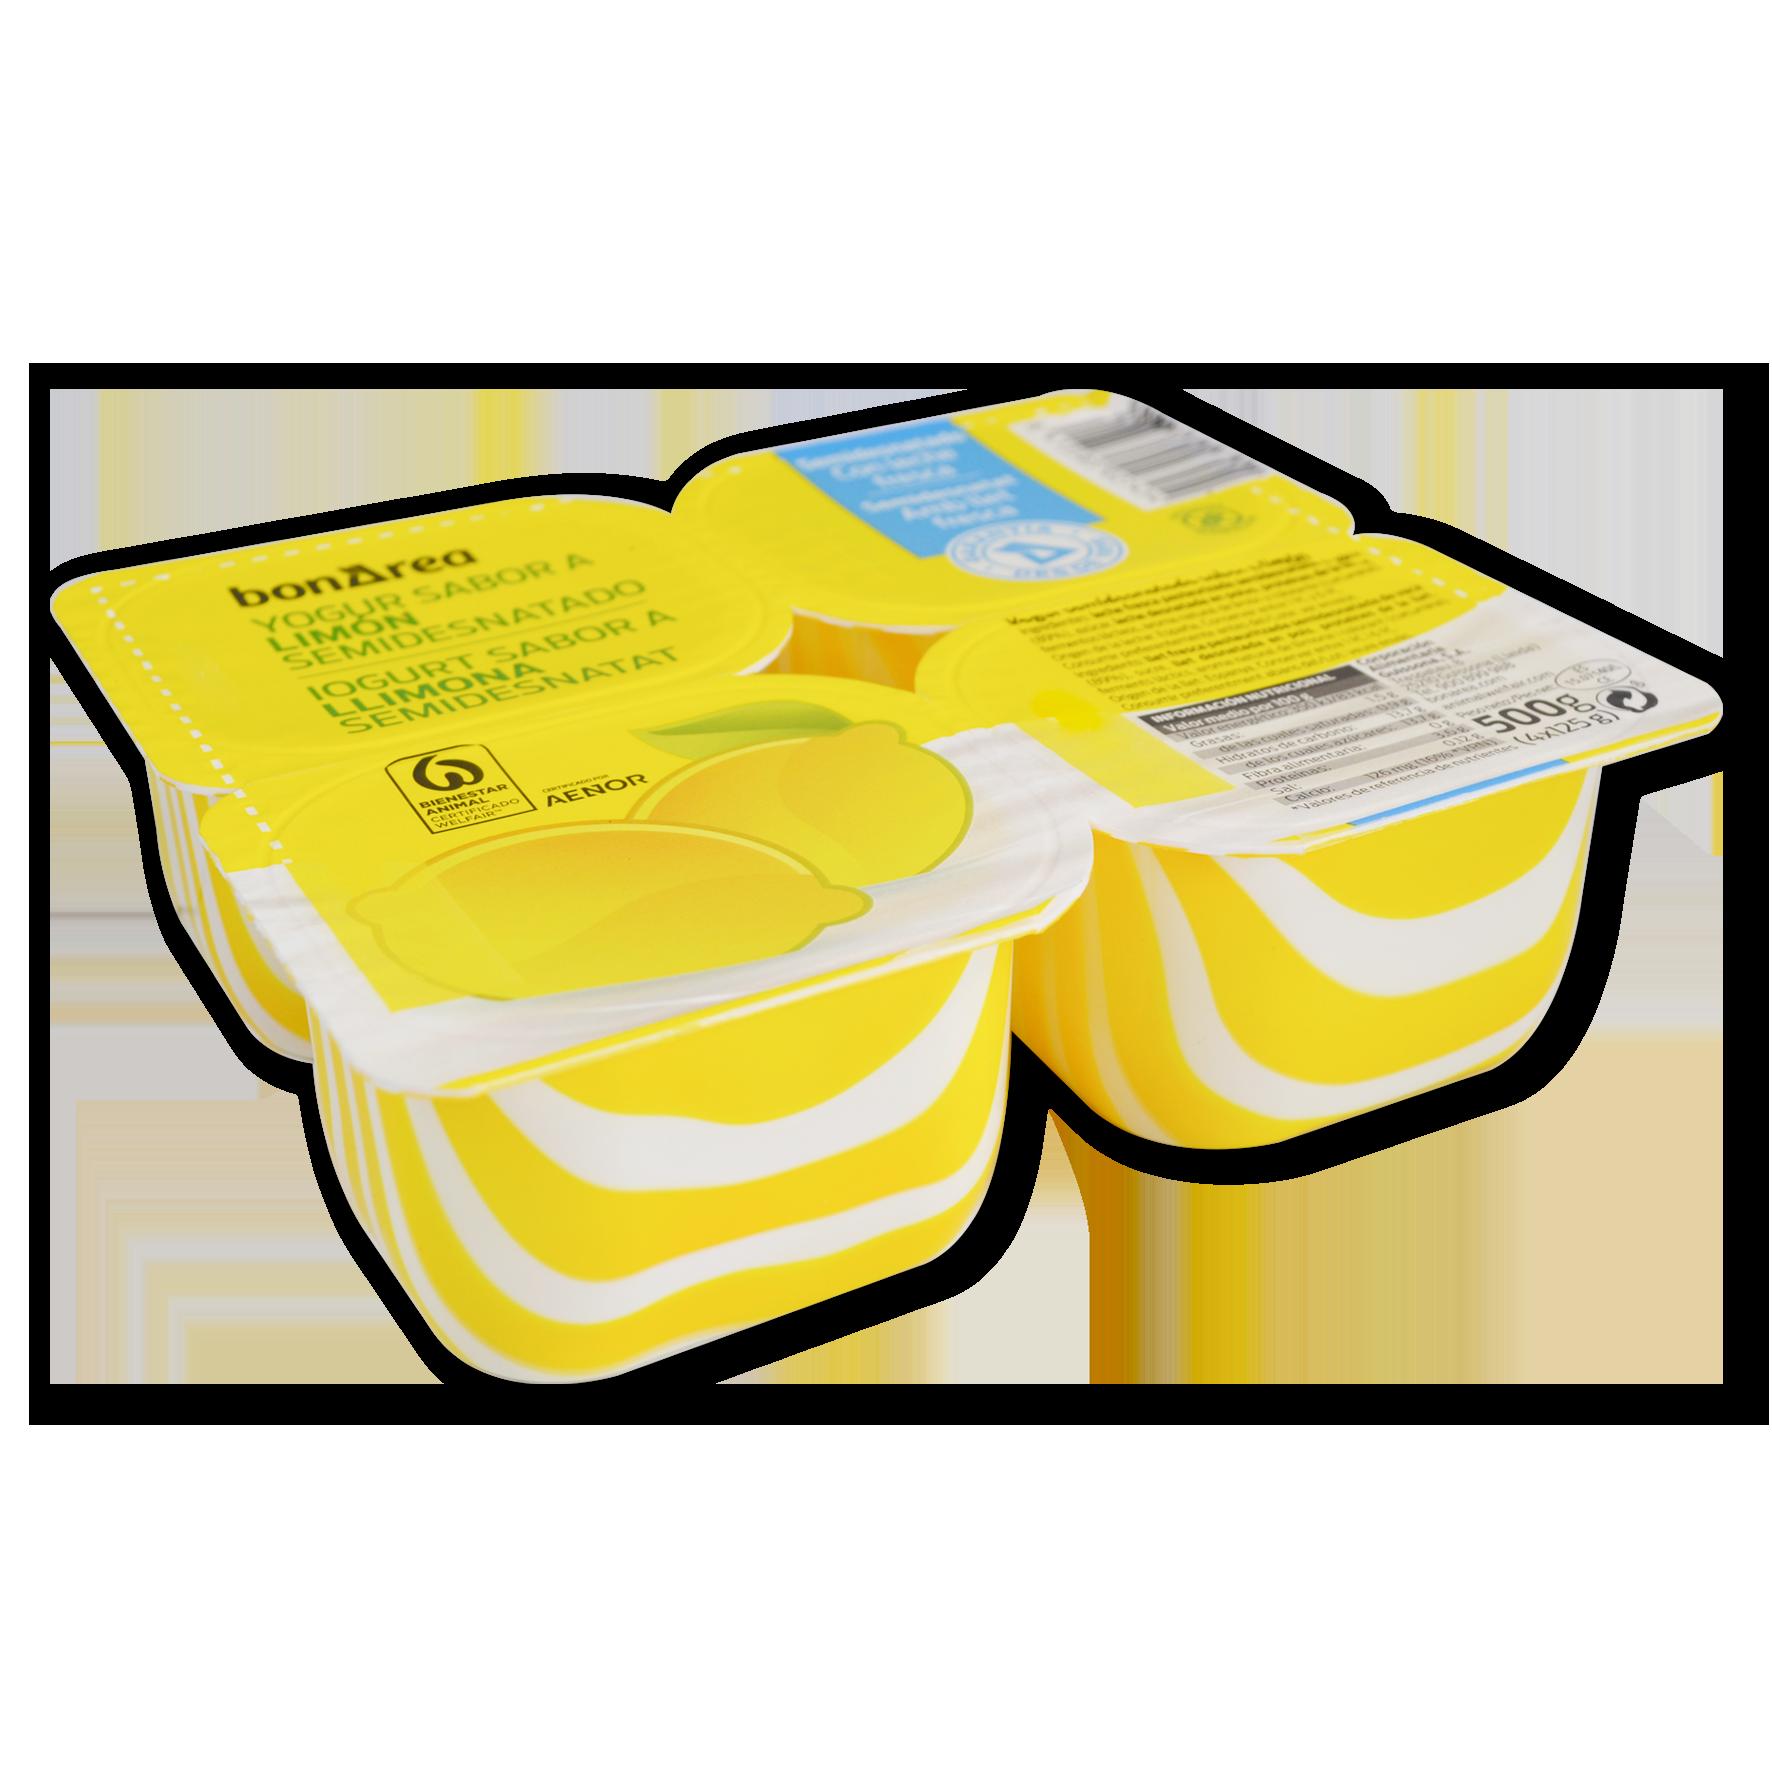 Yogur semidesnatado sabor limón 4 u. de 125 g